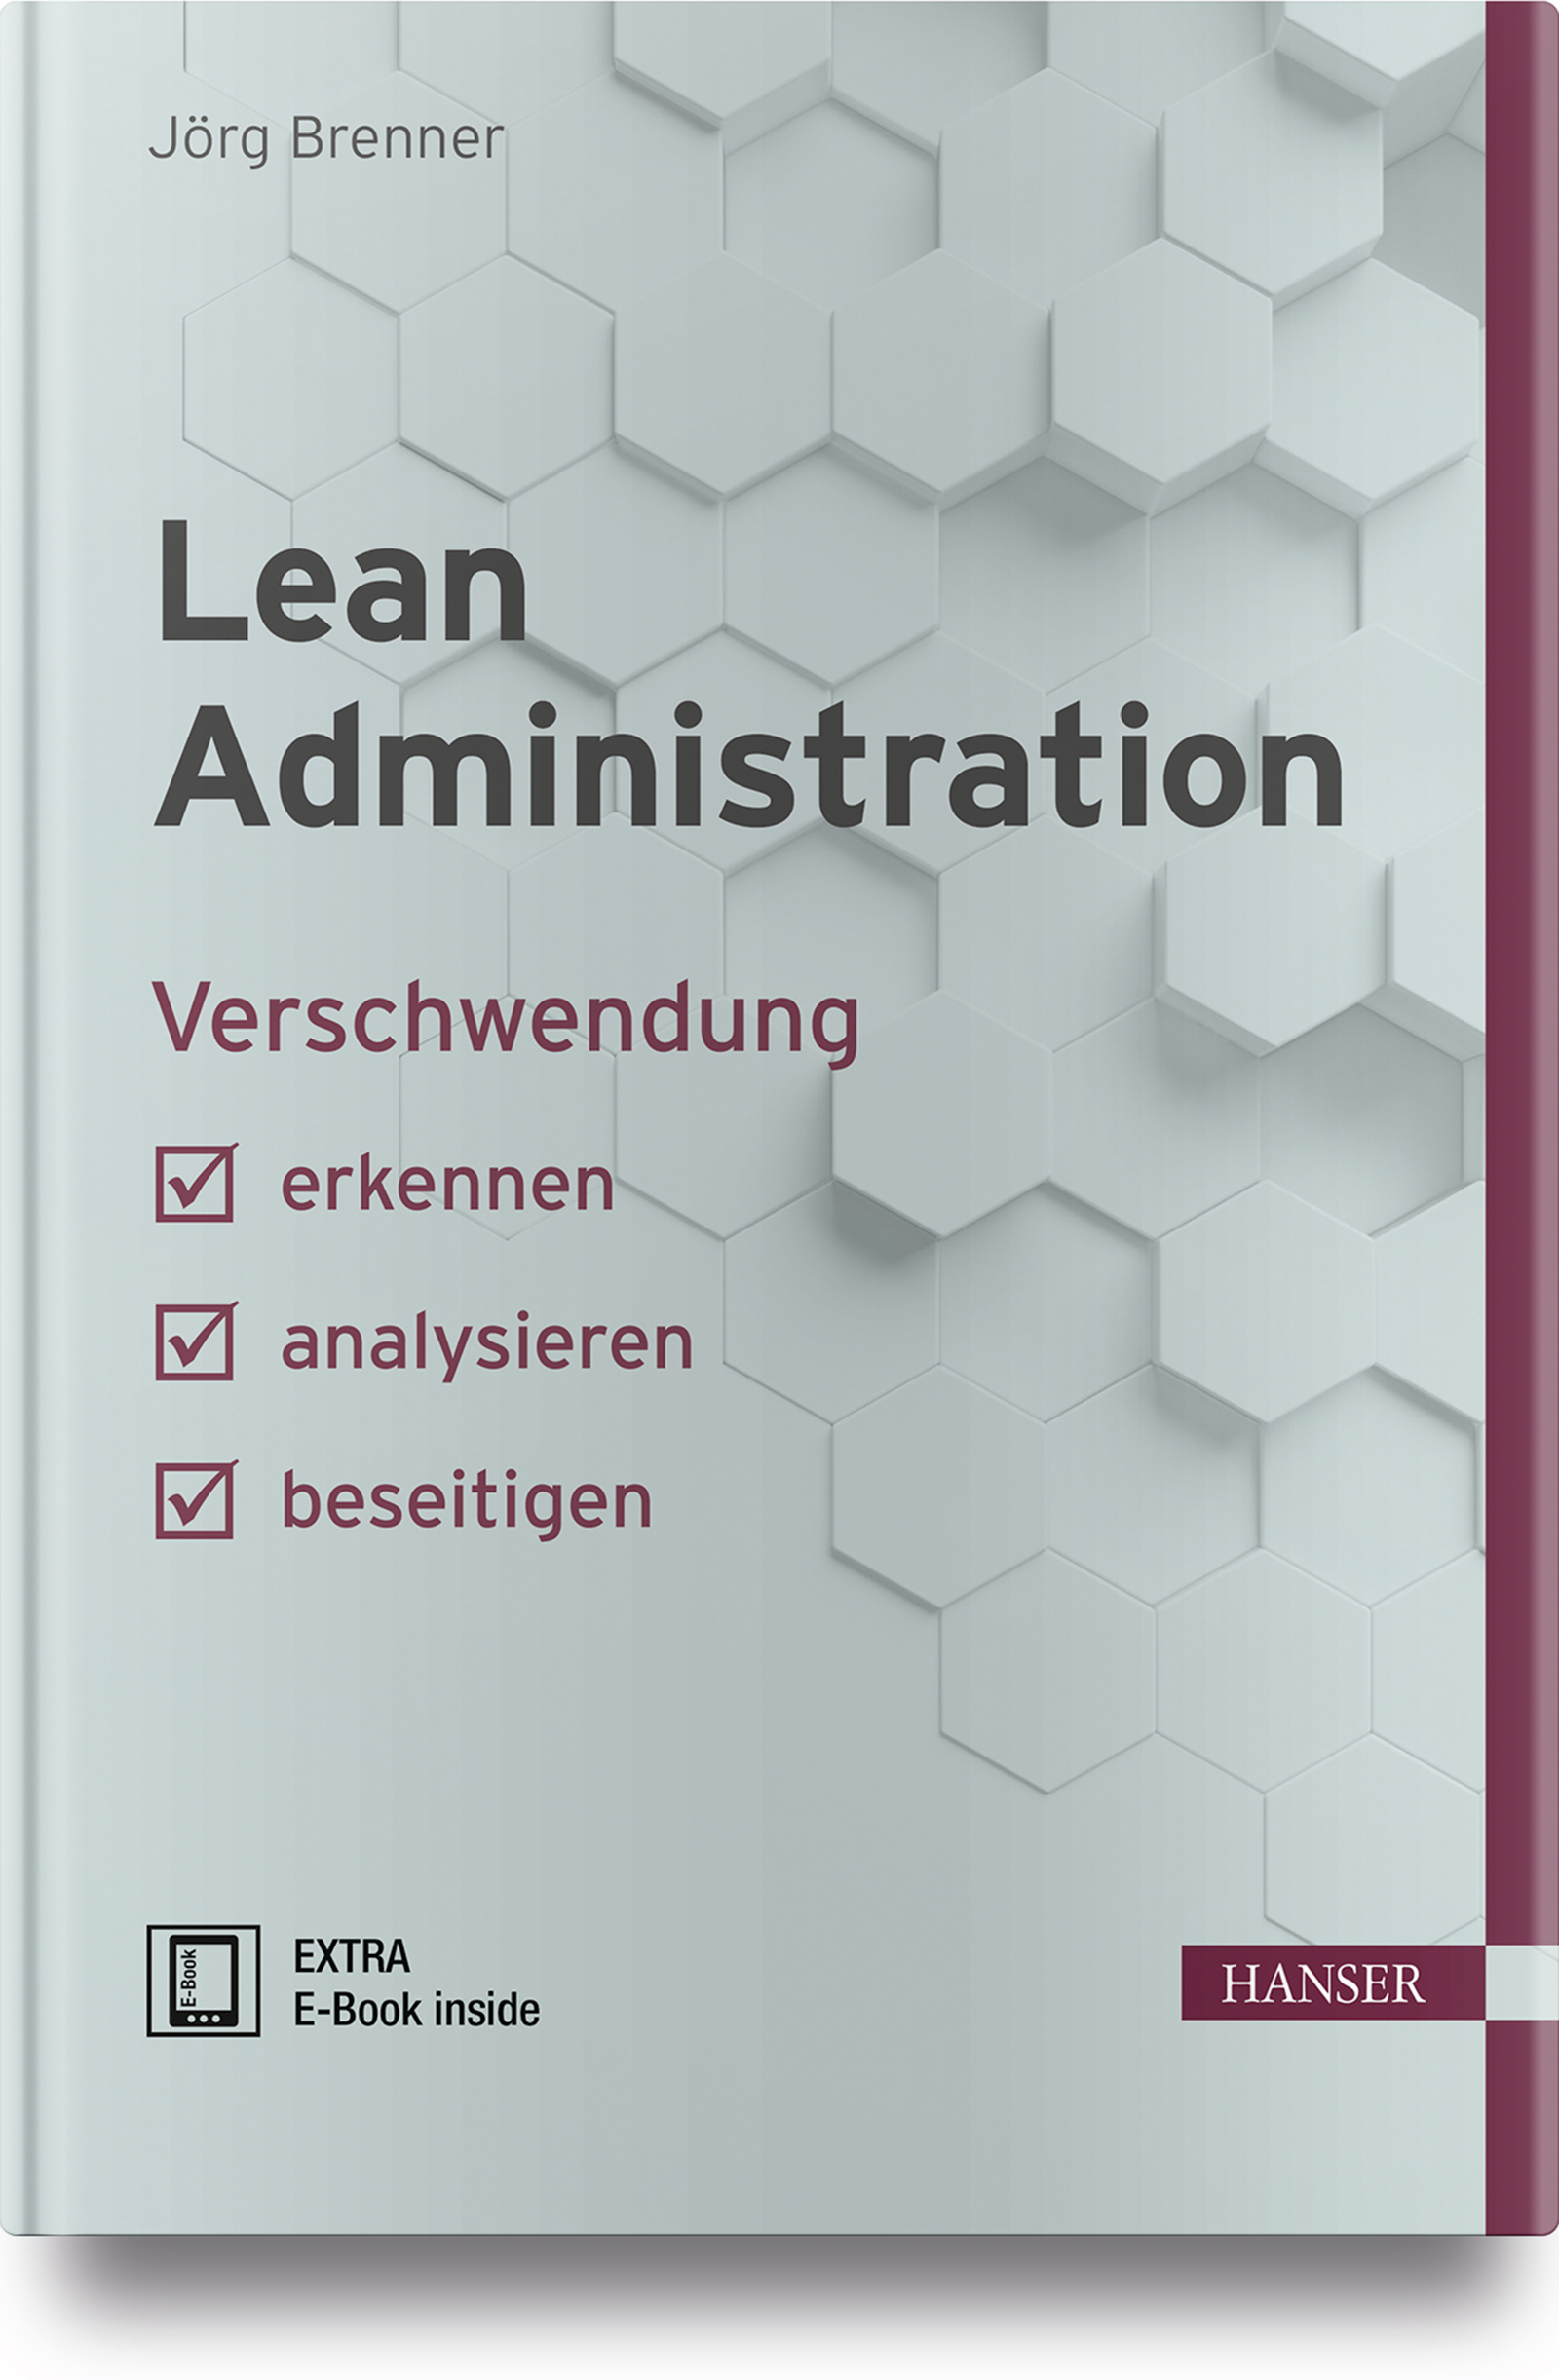 Brenner, Lean Administration, 978-3-446-45472-9